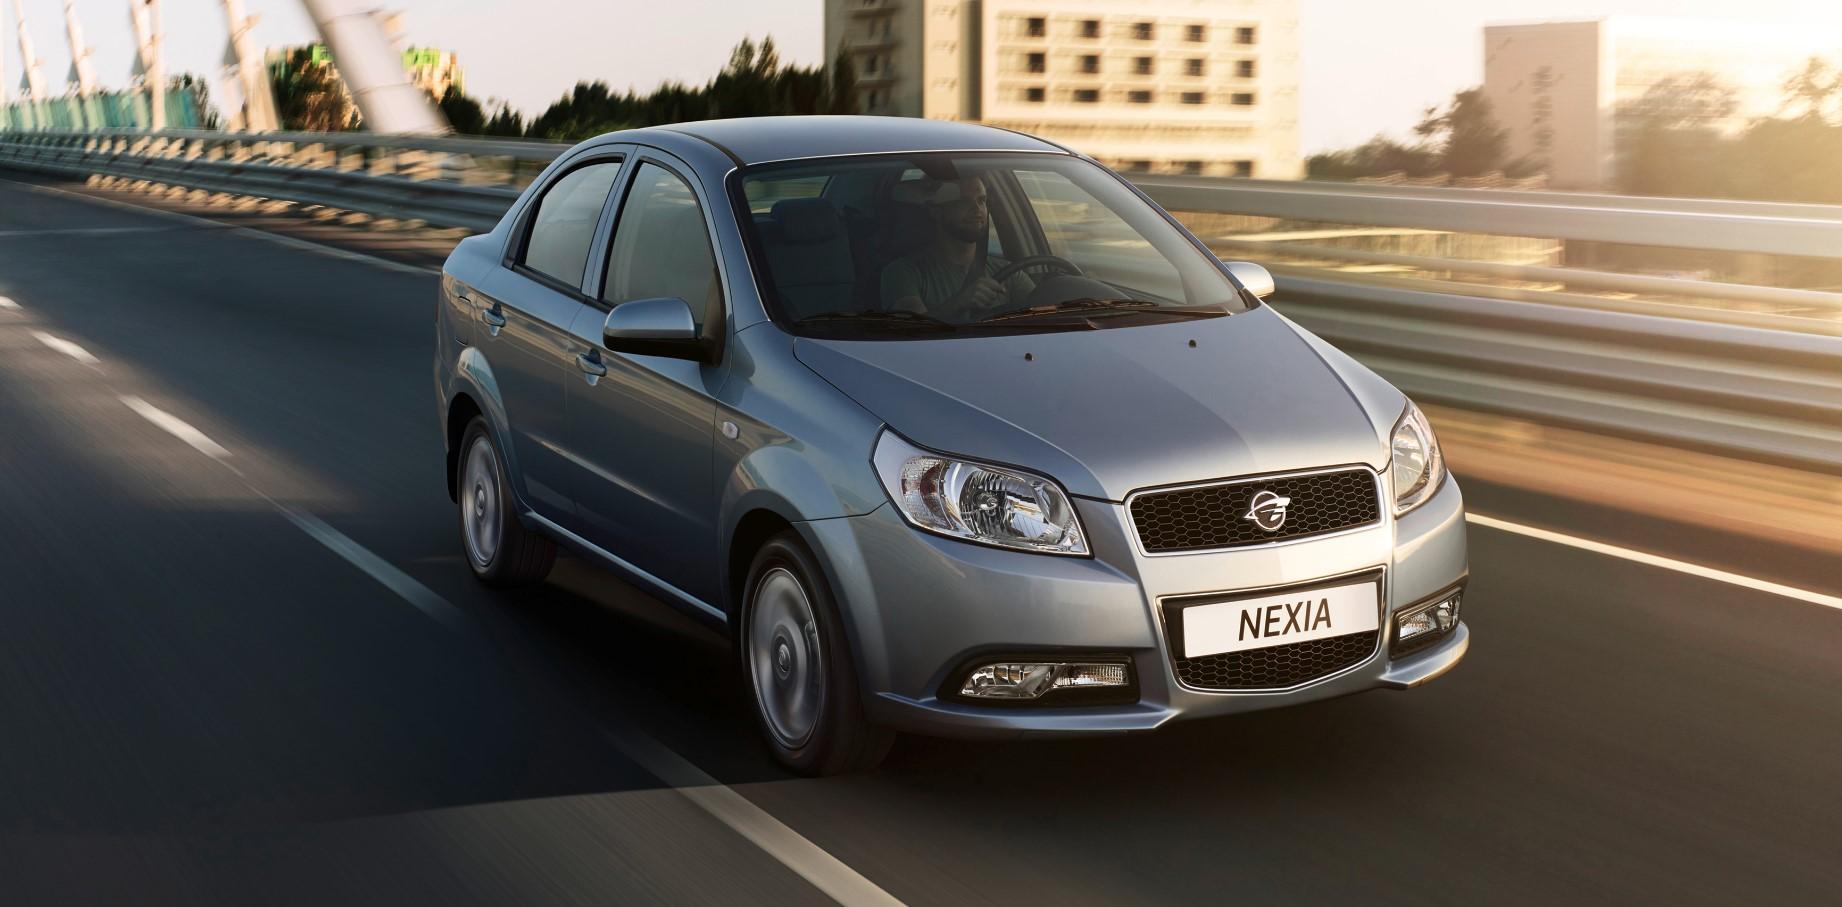 Модели Nexia продавались под марками Daewoo и Ravon, а теперь они получат шильдик Chevrolet